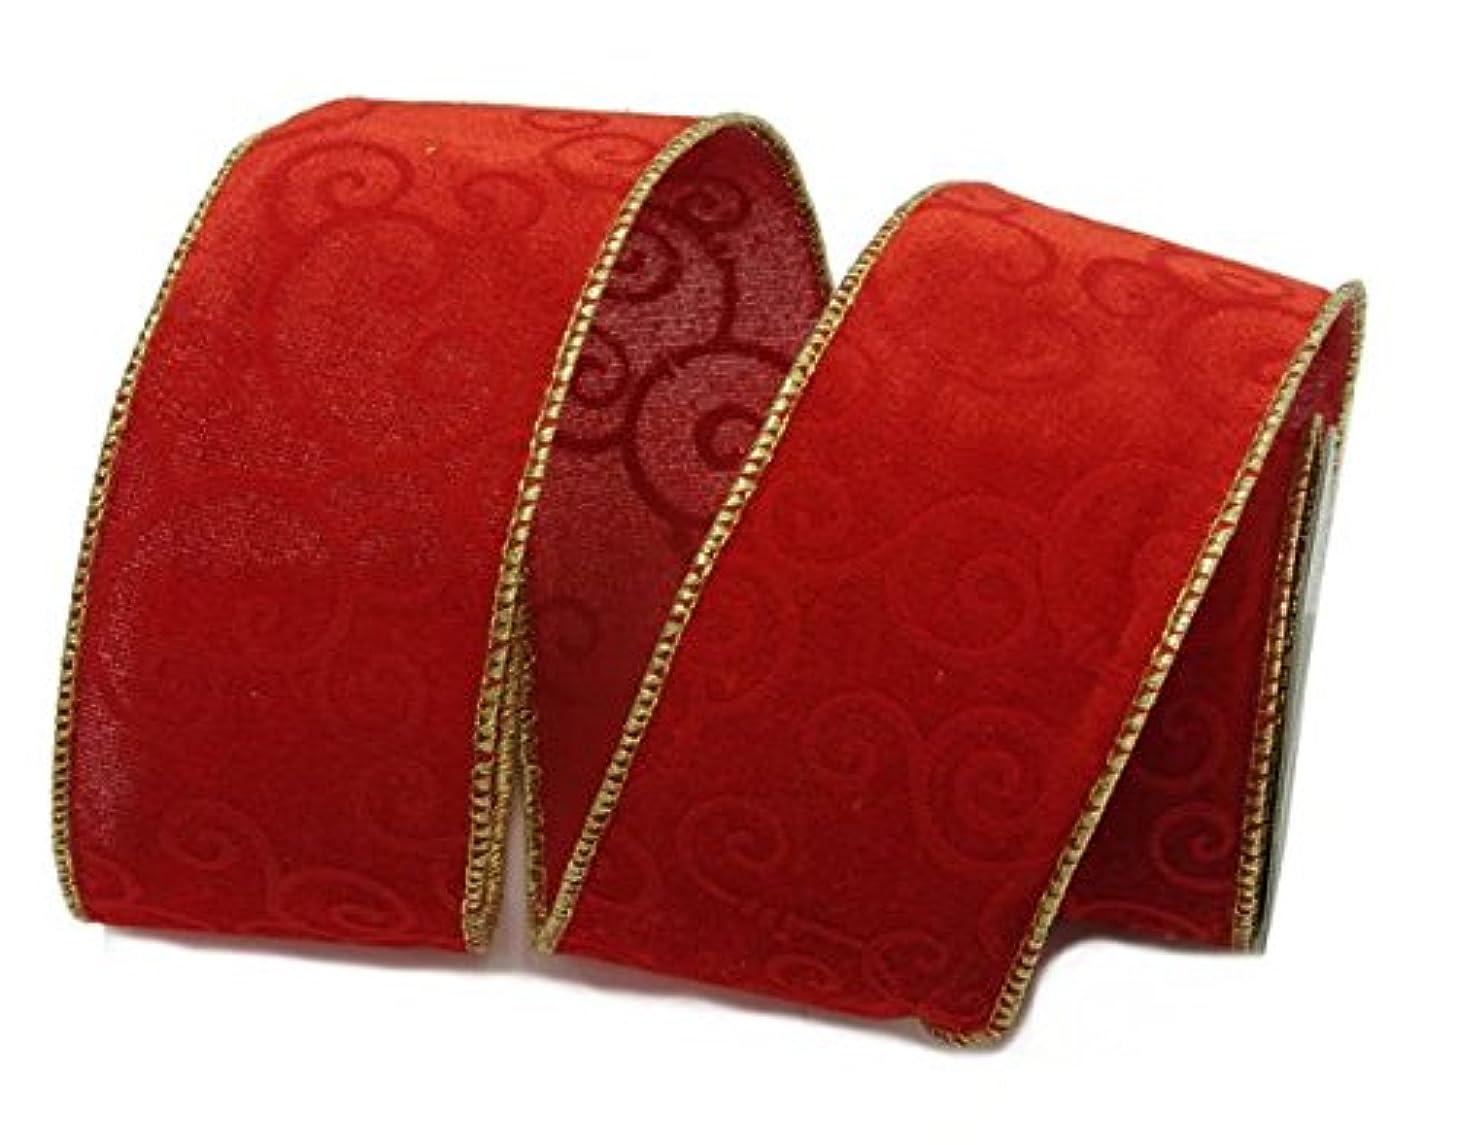 Renaissance 2000 11698 Velvet Lamour Print Fabric Ribbon, Red/Gold